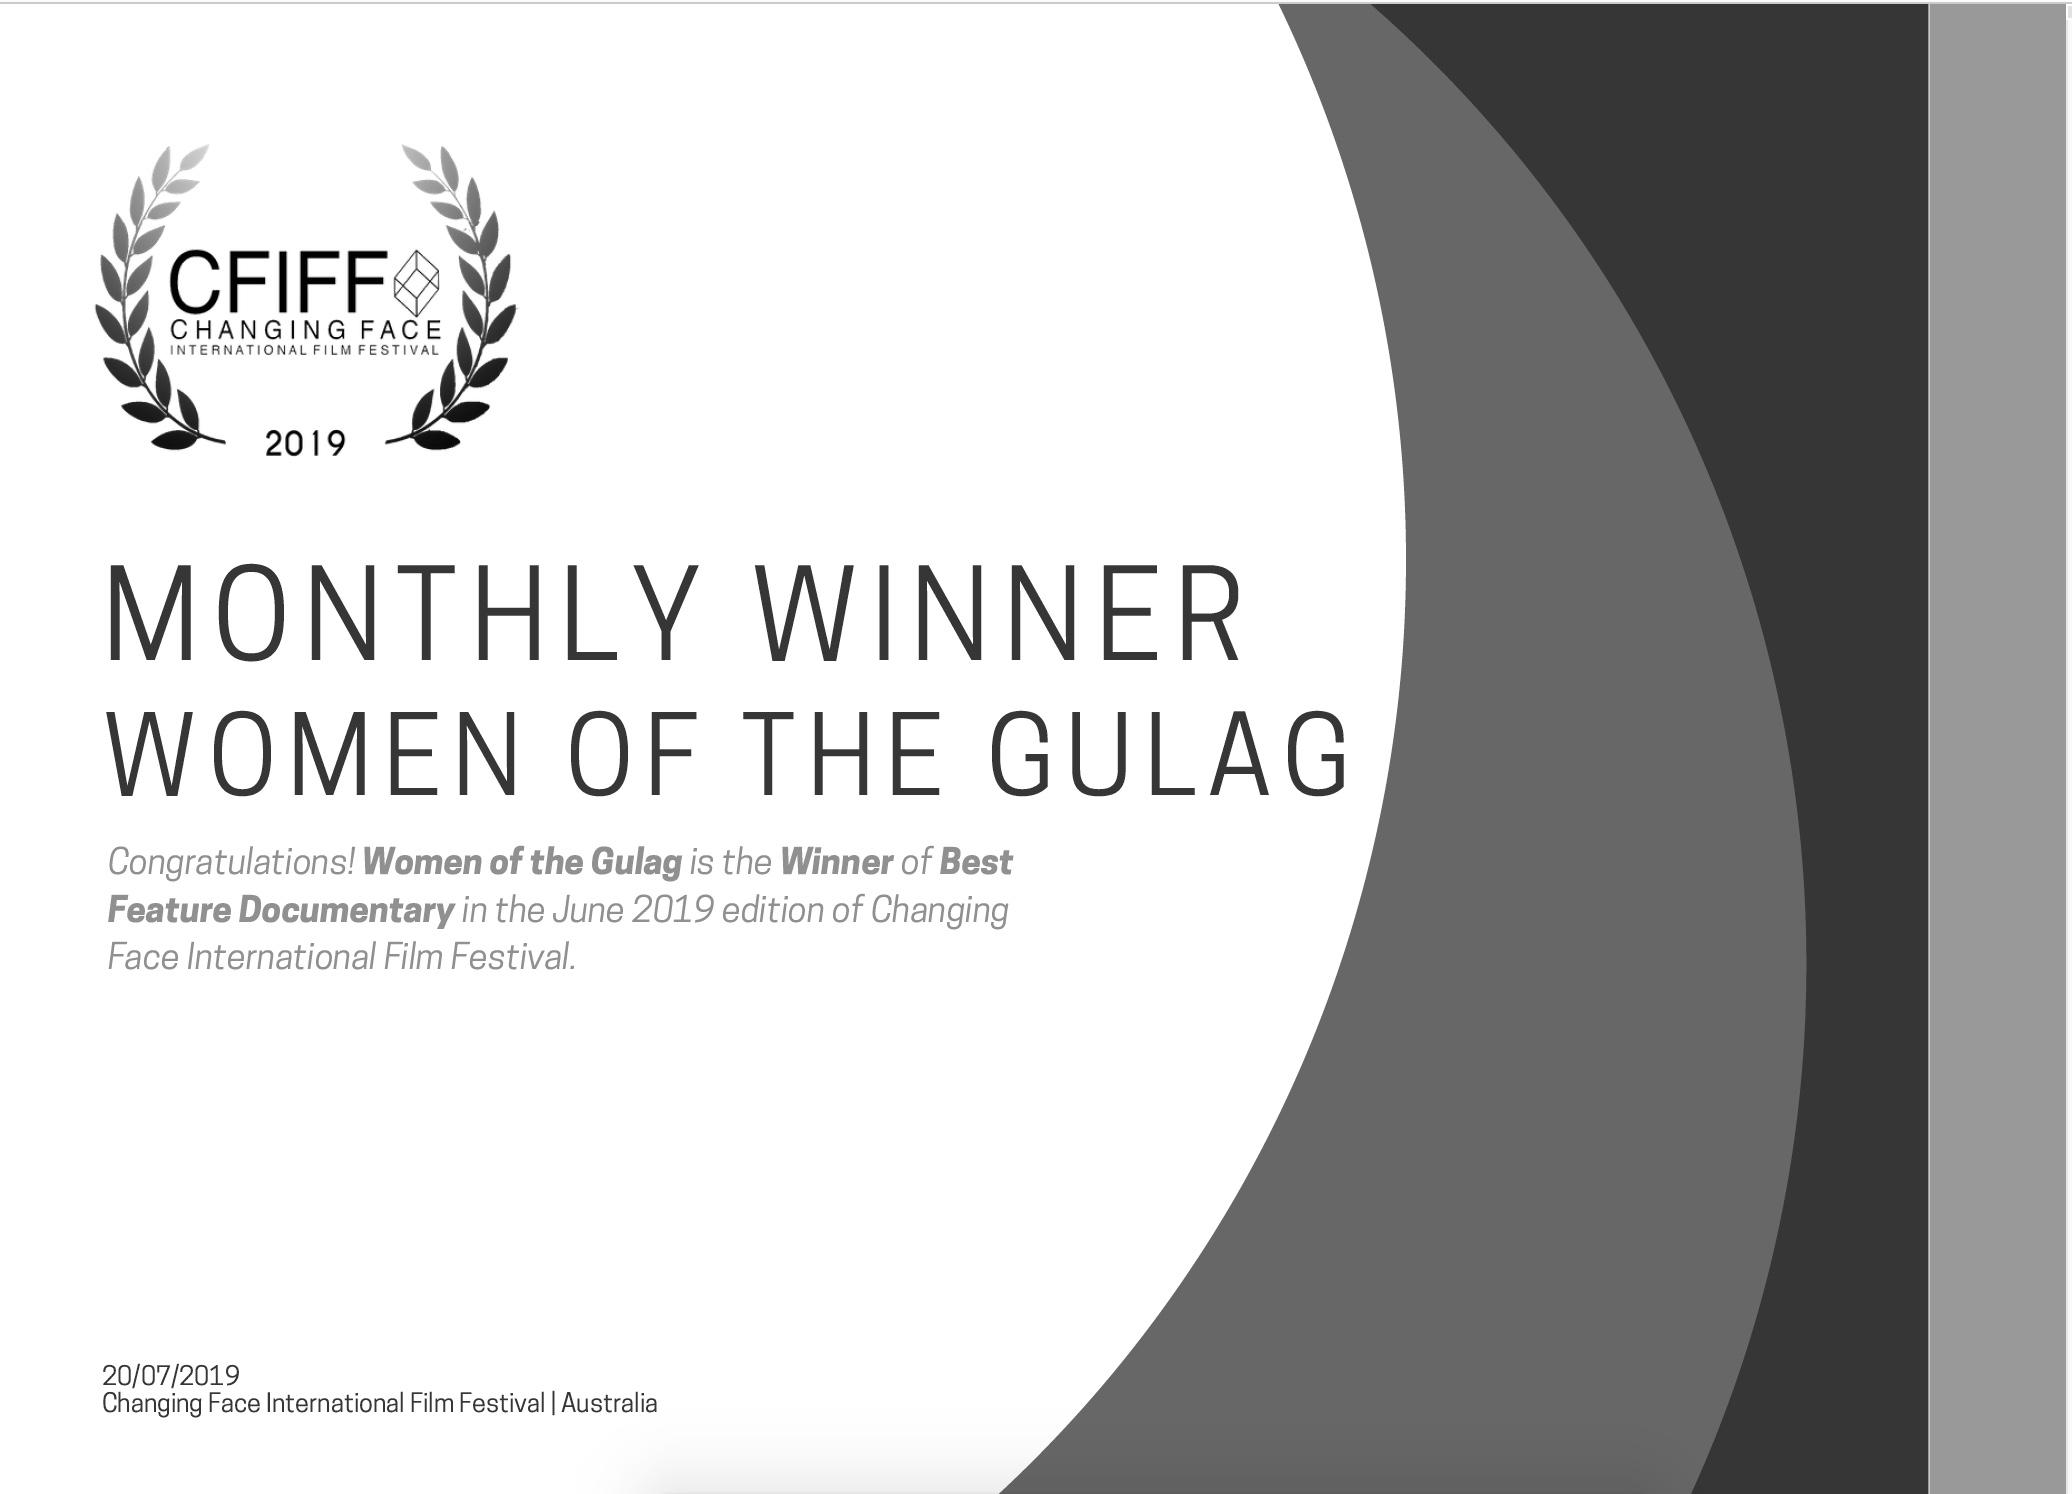 CLIFF 2019 - Monthly Winner